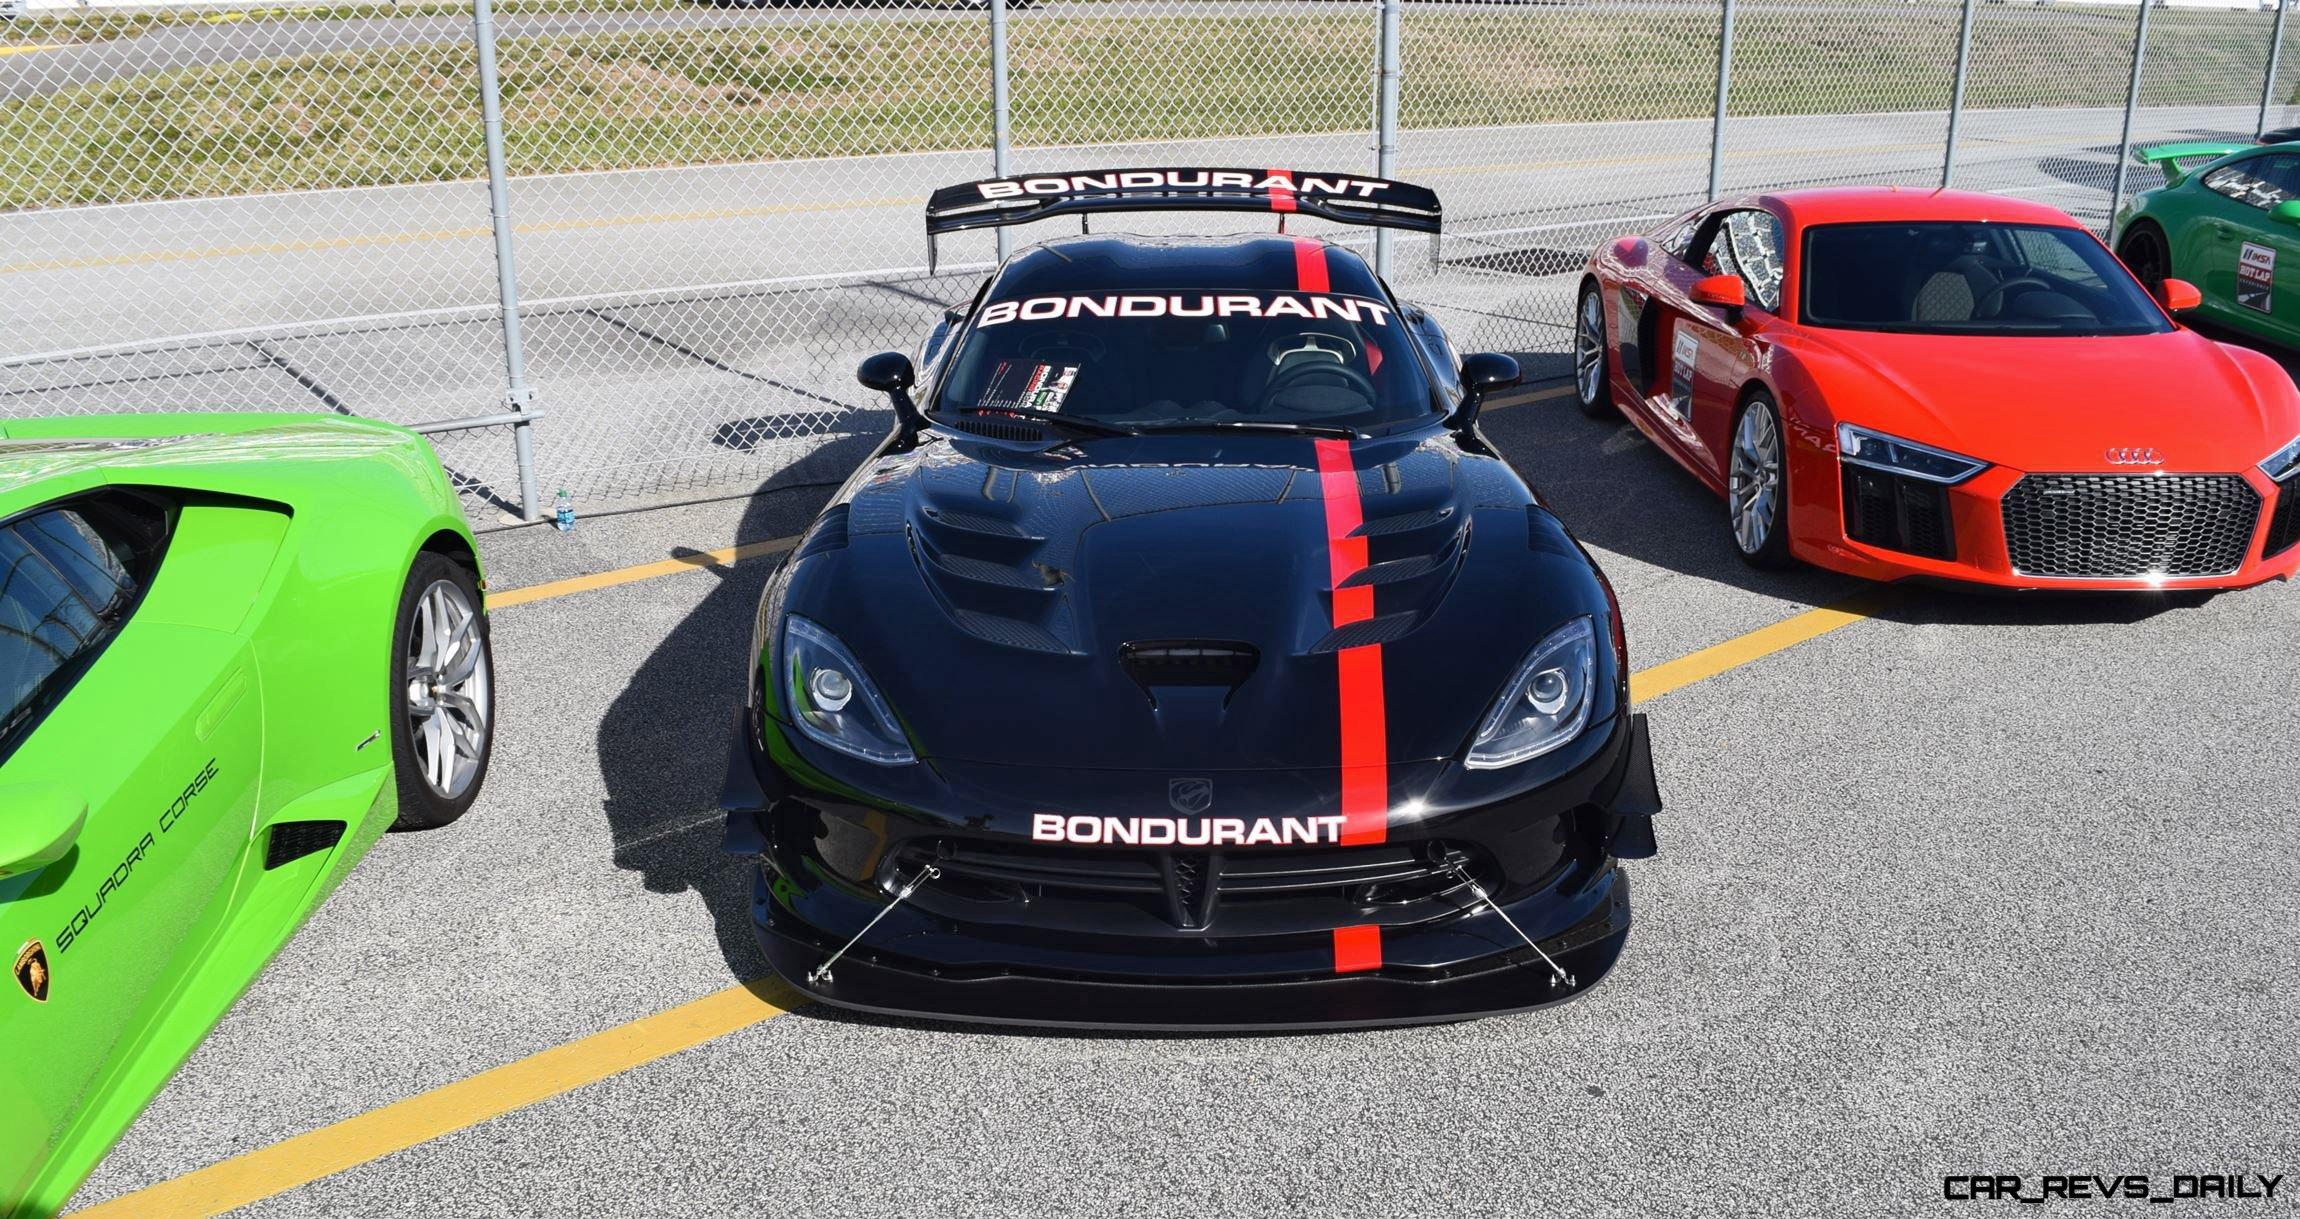 2016 Dodge VIPER ACR - Bondurant Black 4